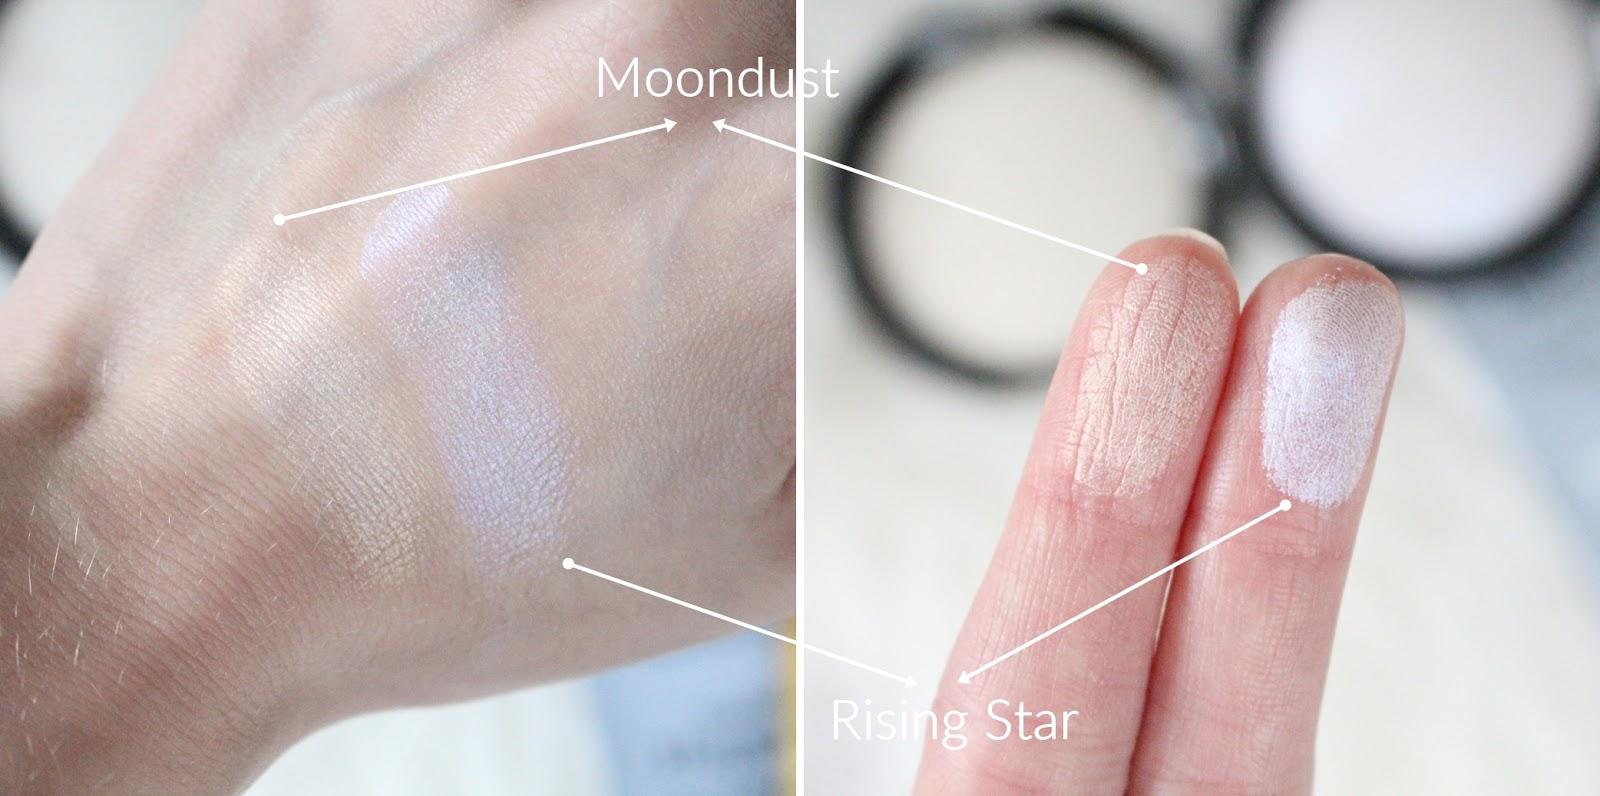 my-secret-moondust-rising-star